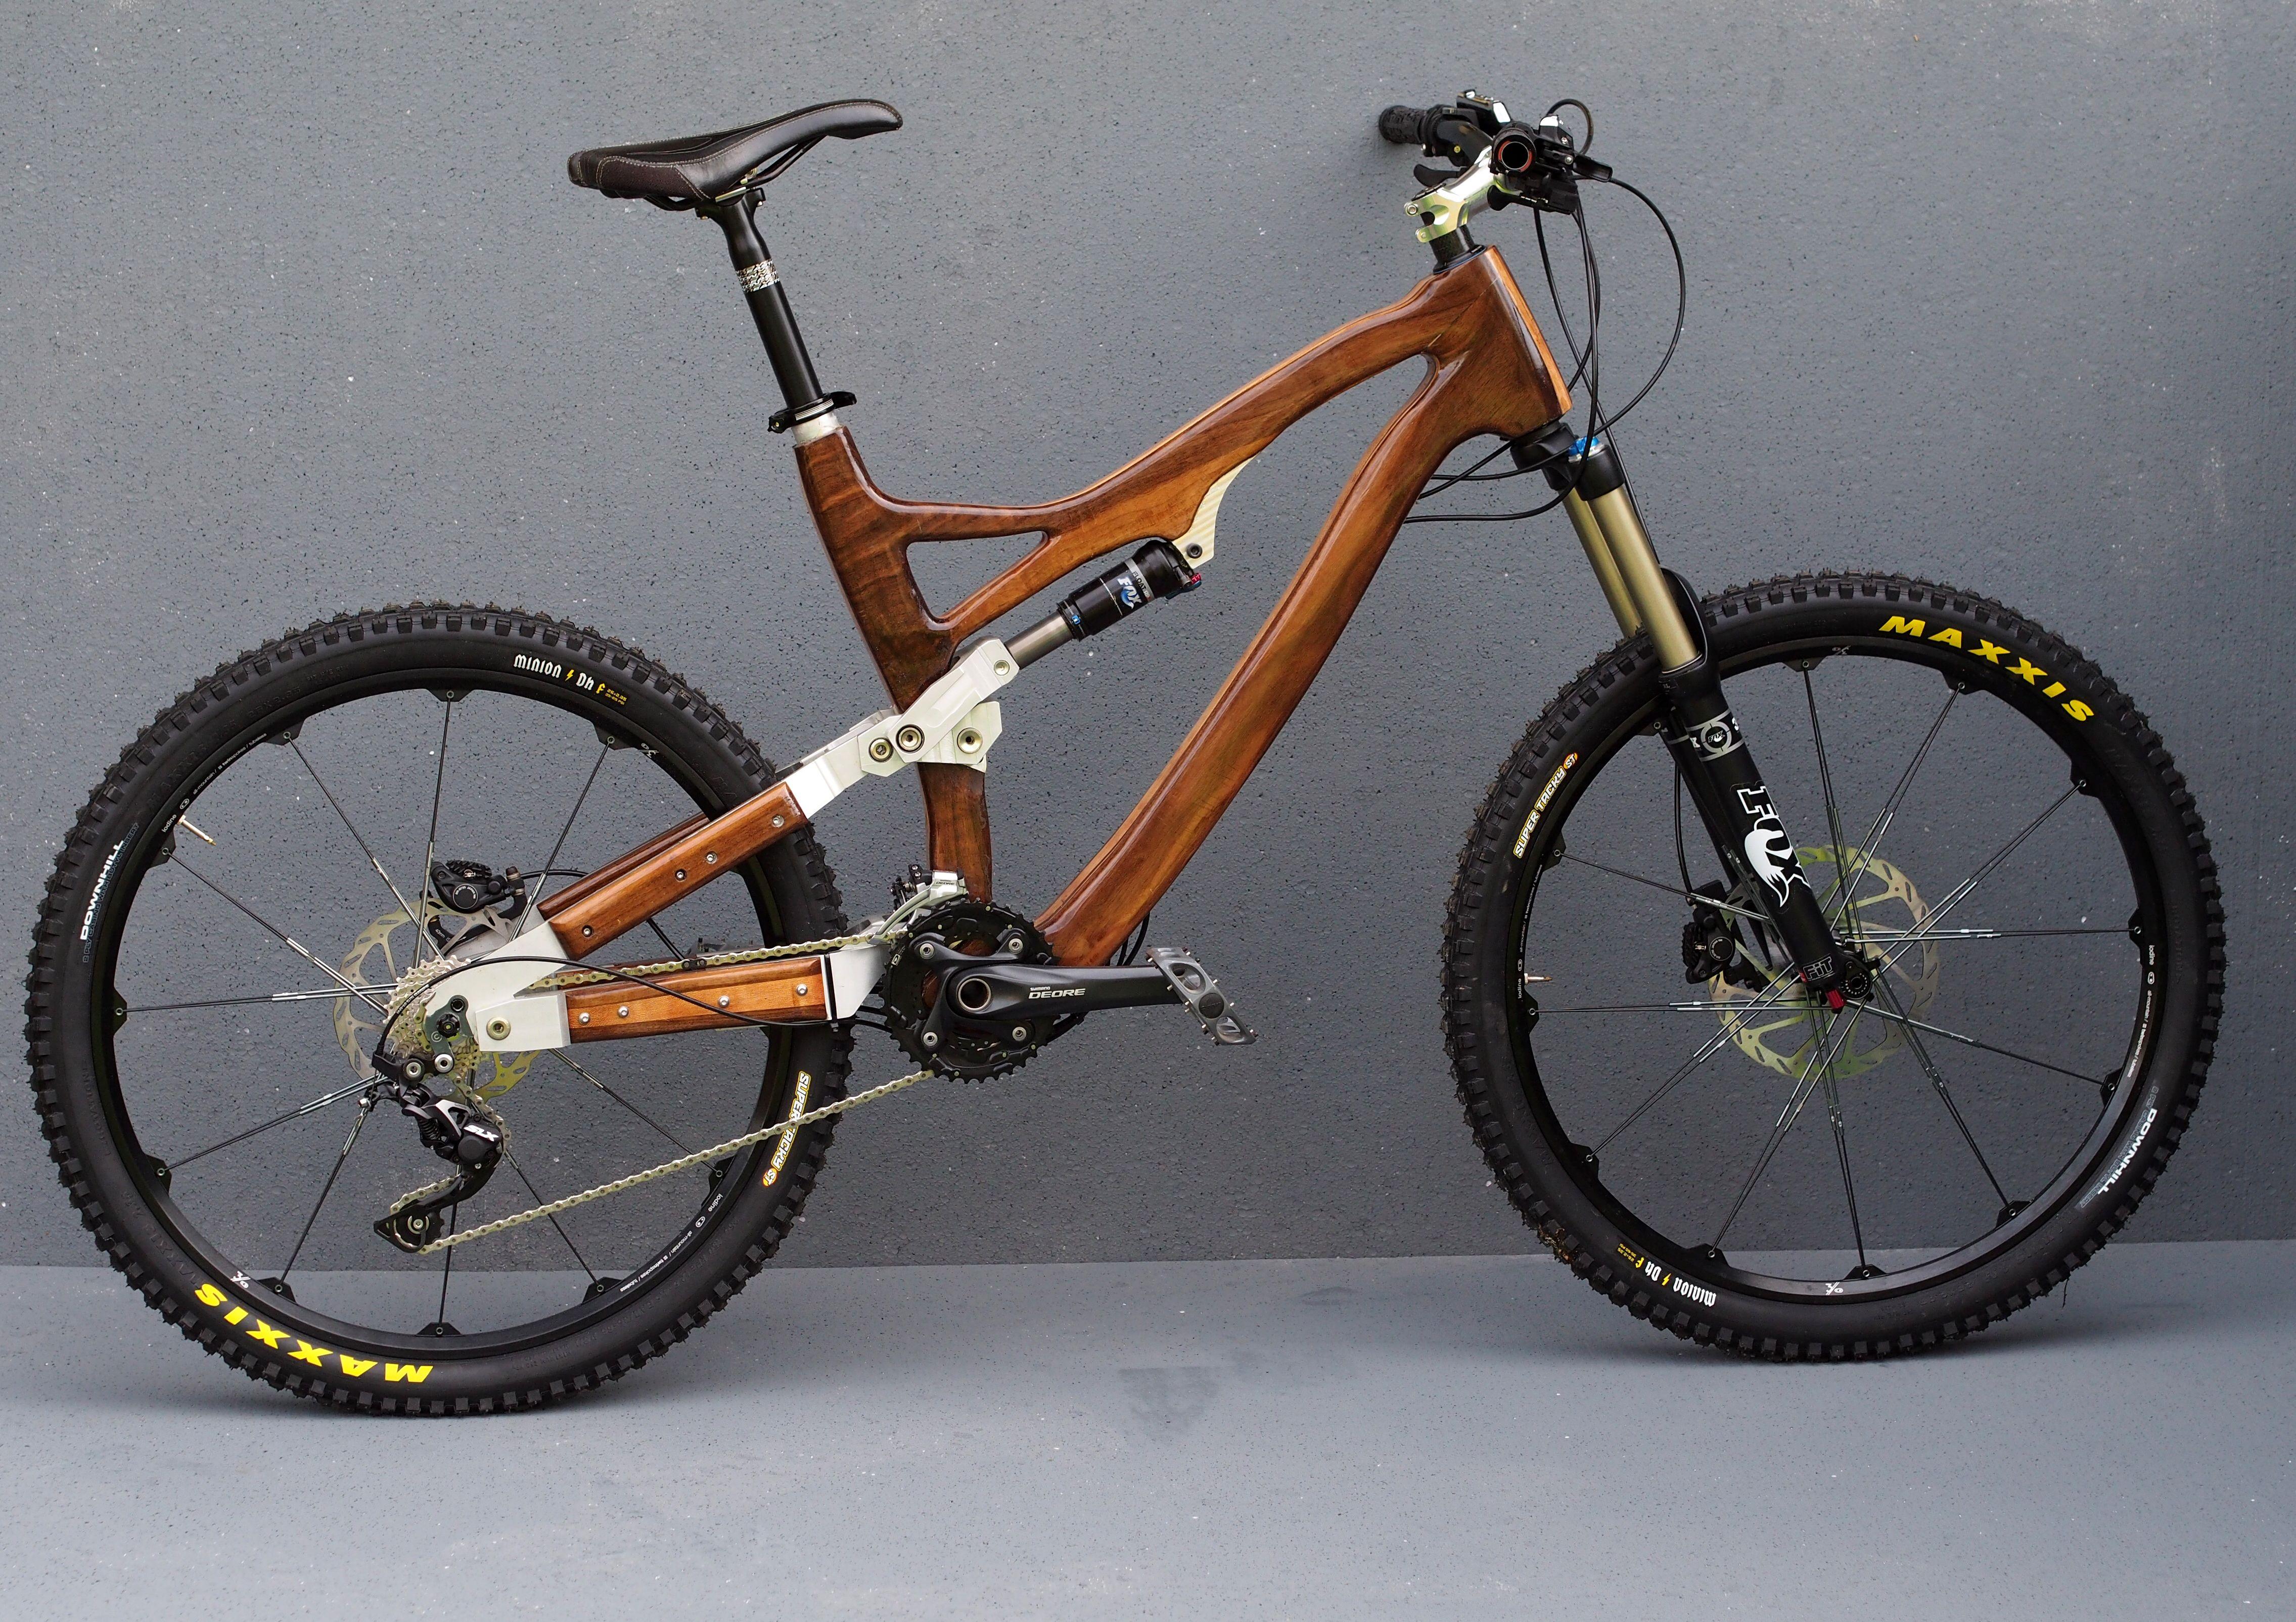 Full Suspension Mountain Bike Wooden Bicycle Wood Bike Folding